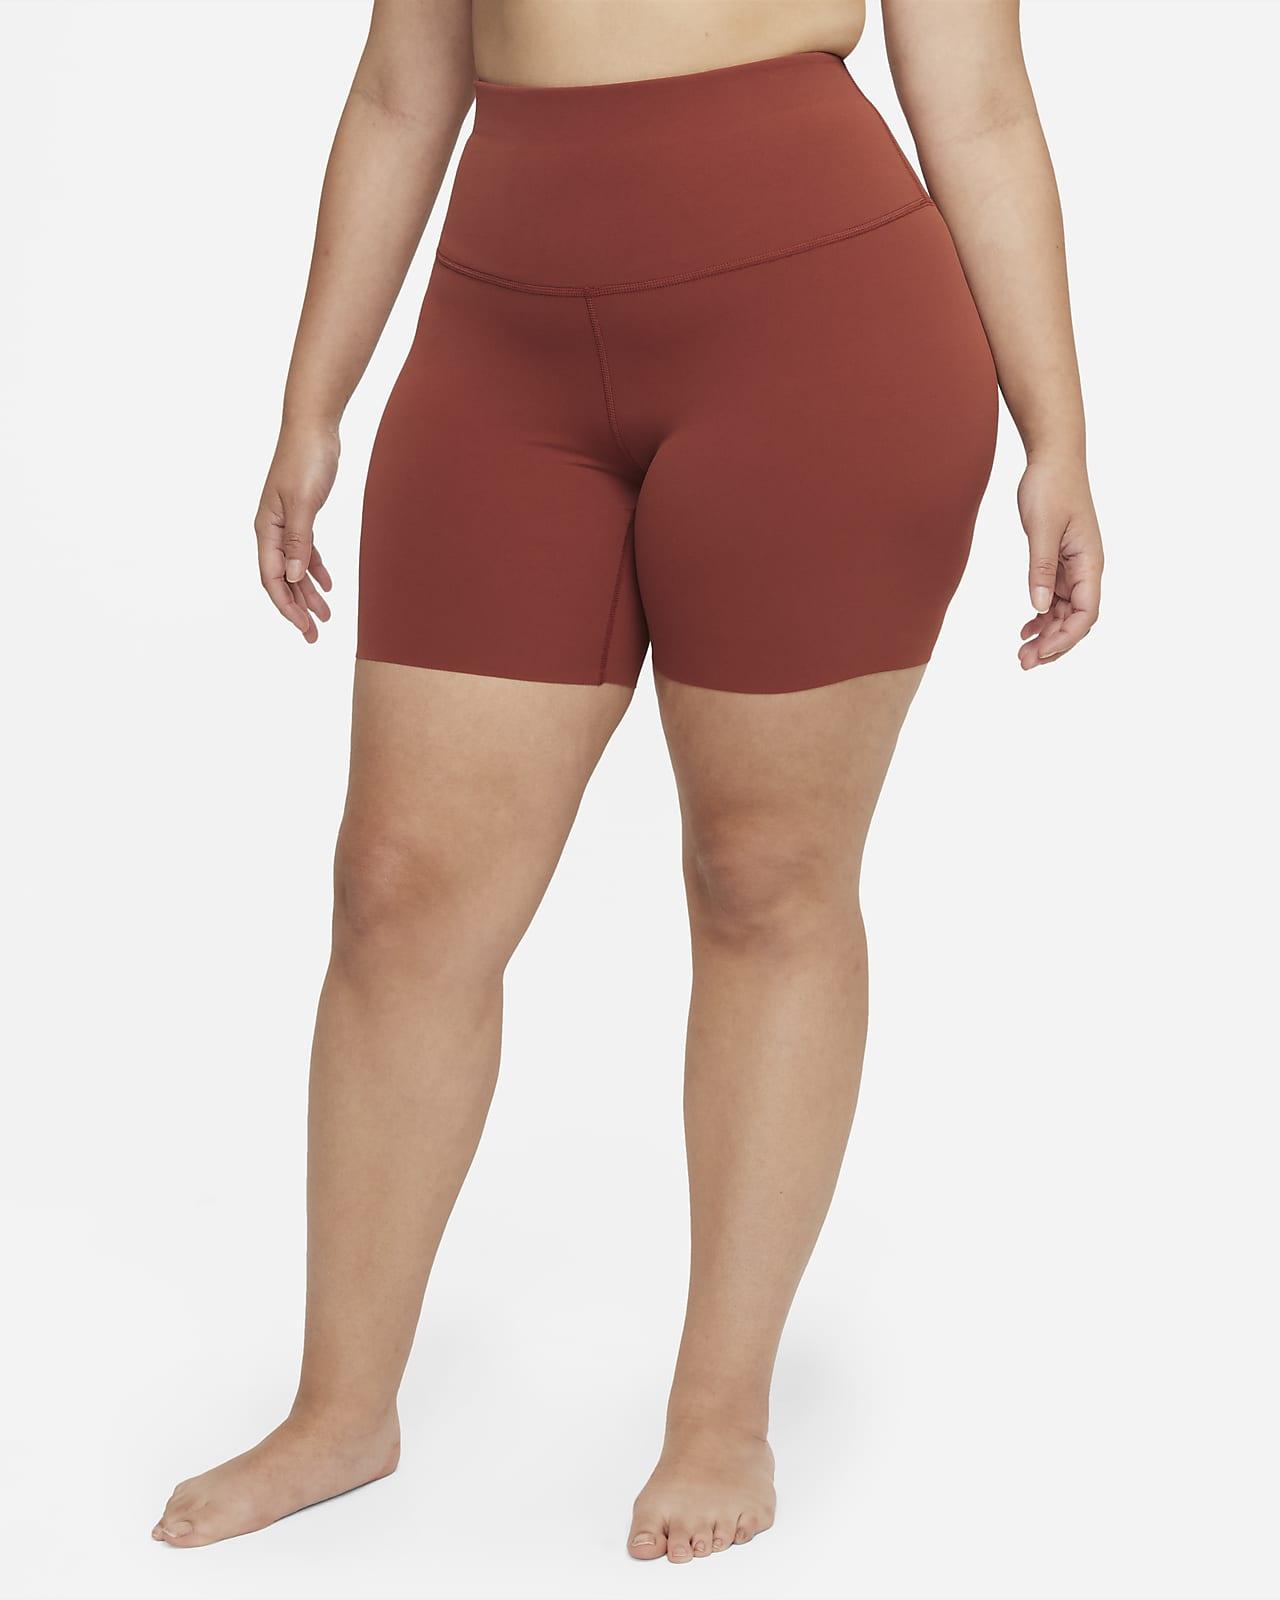 Nike Yoga Luxe Women's Shorts (Plus Size)